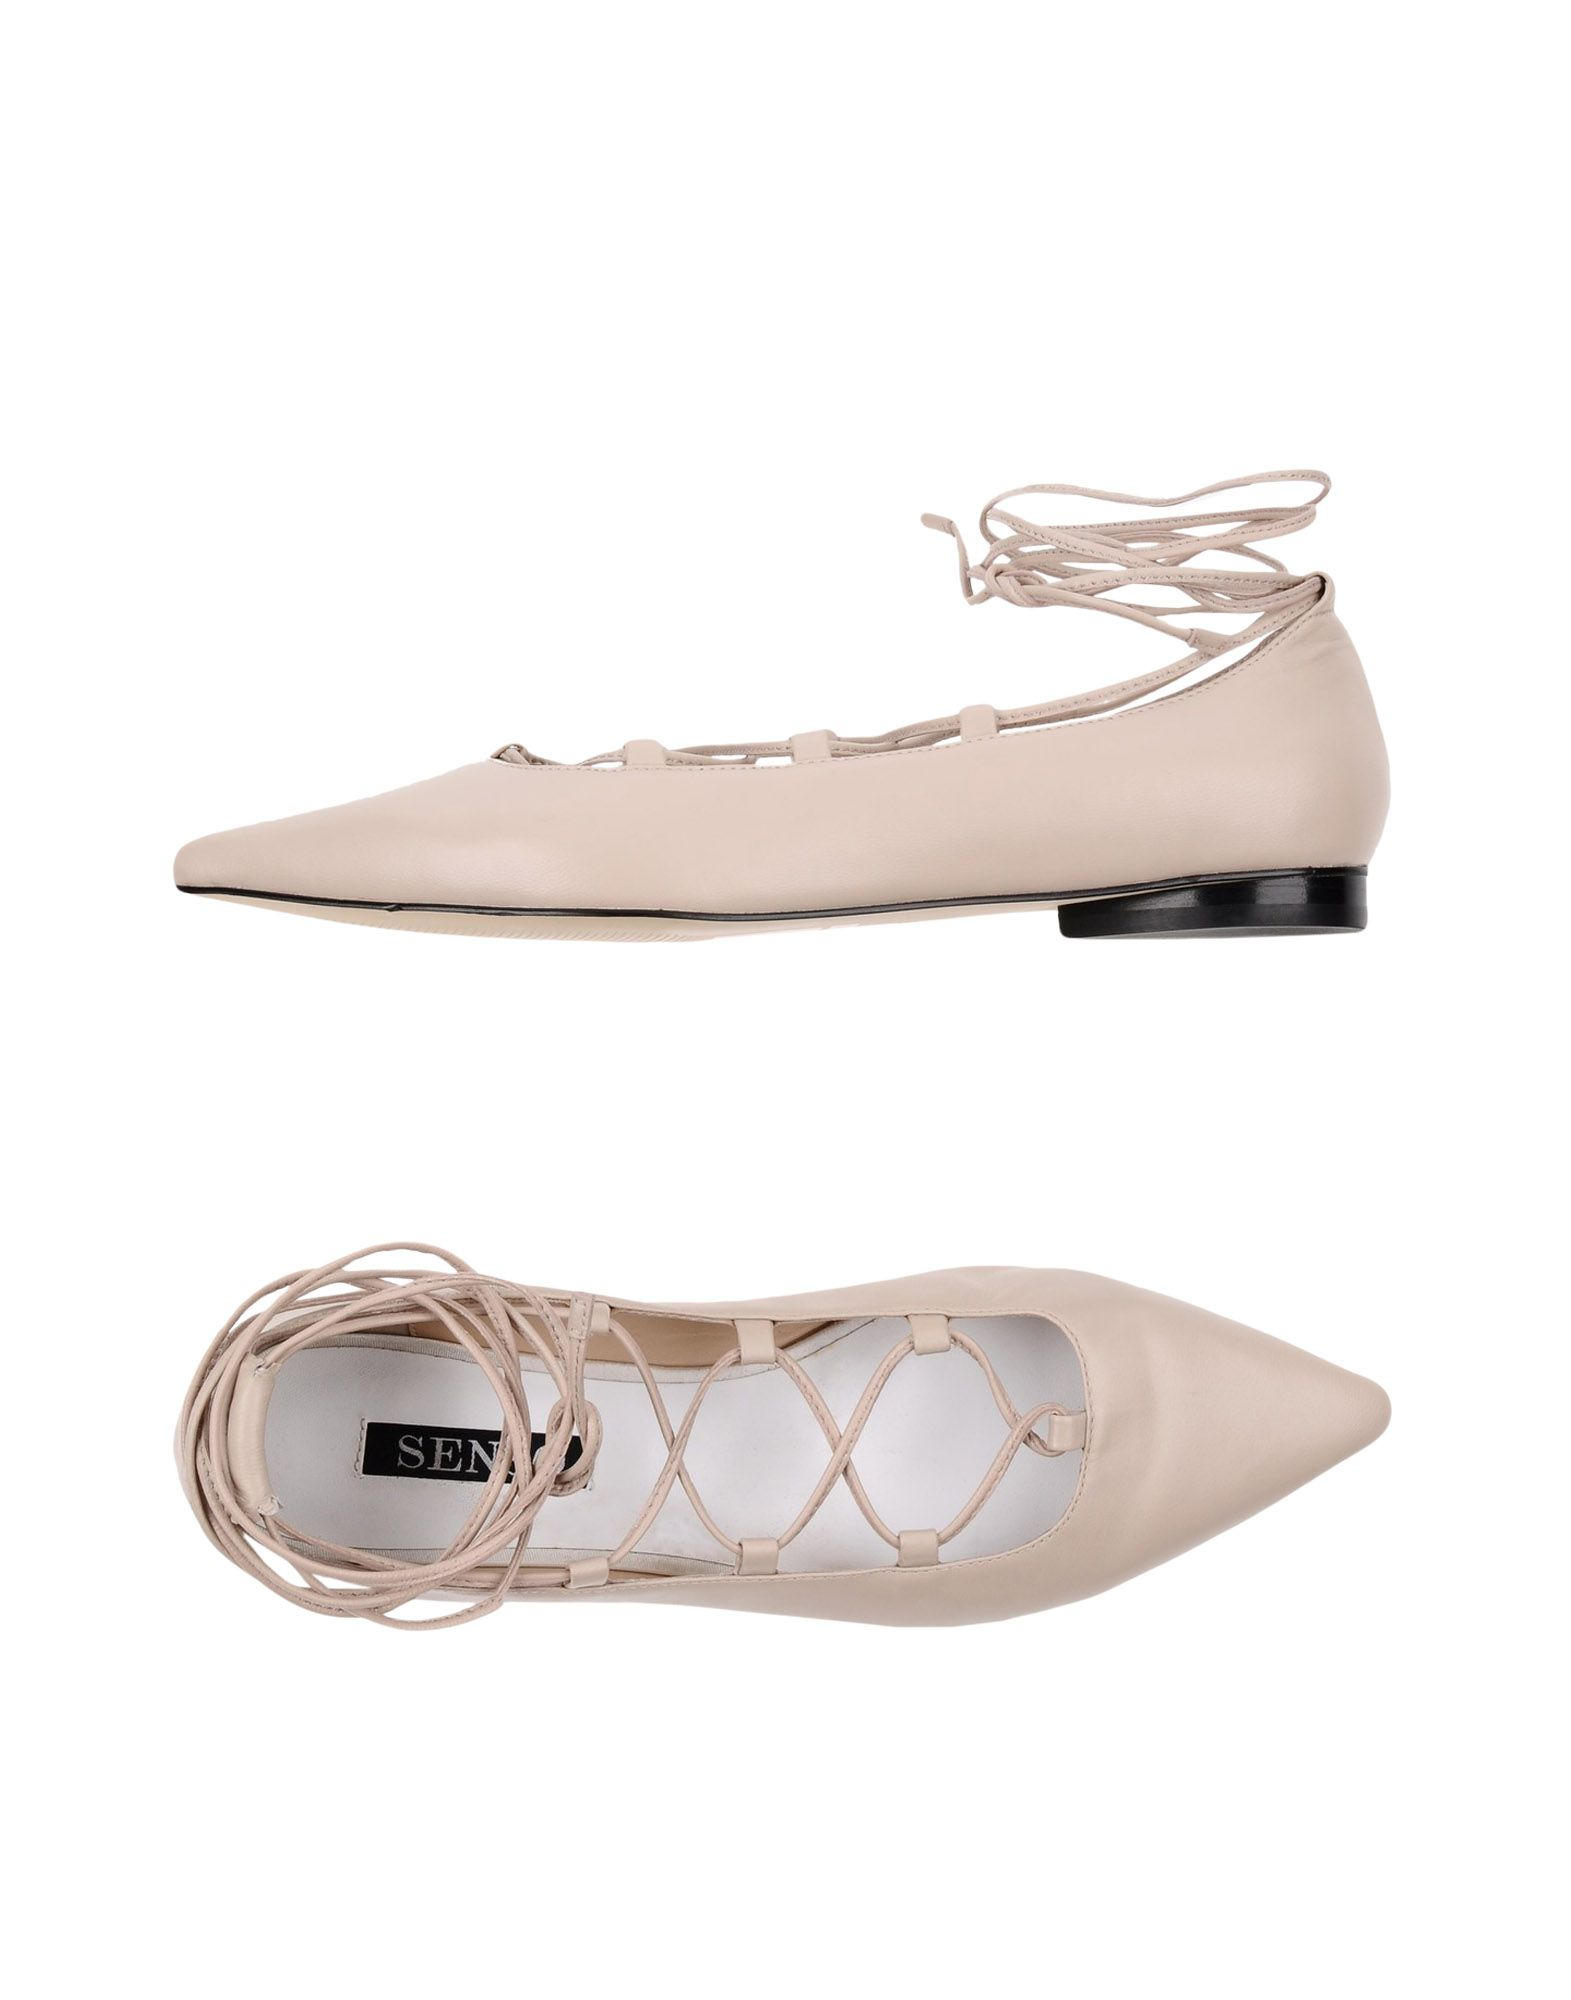 Moda Ballerine Senso Donna - 11117852SD 11117852SD - ddf2b1